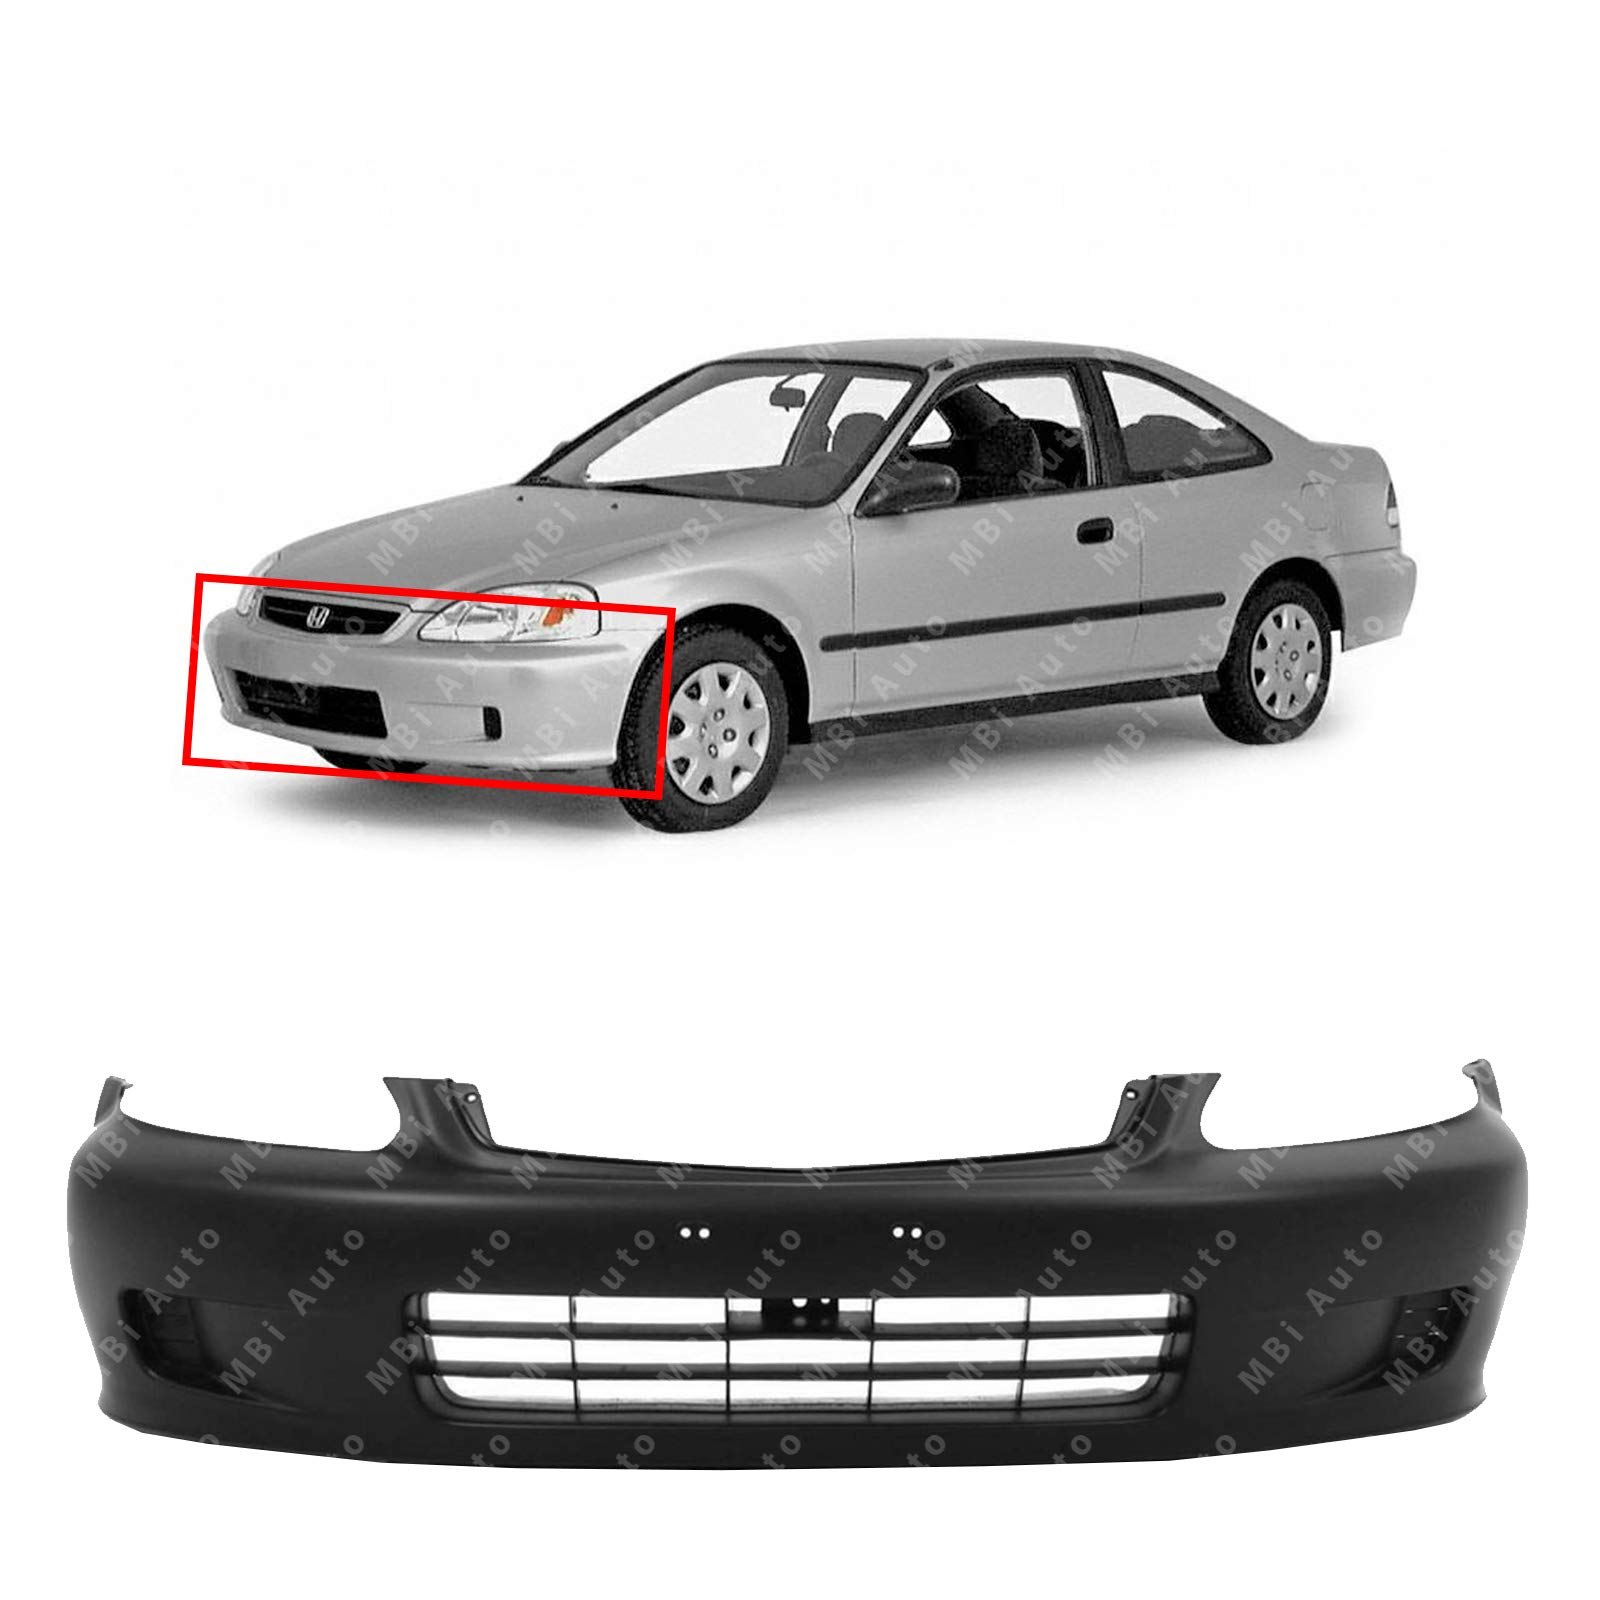 MBI AUTO - Primered, Front Bumper Cover Fascia for 1999 2000 Honda Civic Sedan, Coupe, Hatchback 99-00, HO1000184